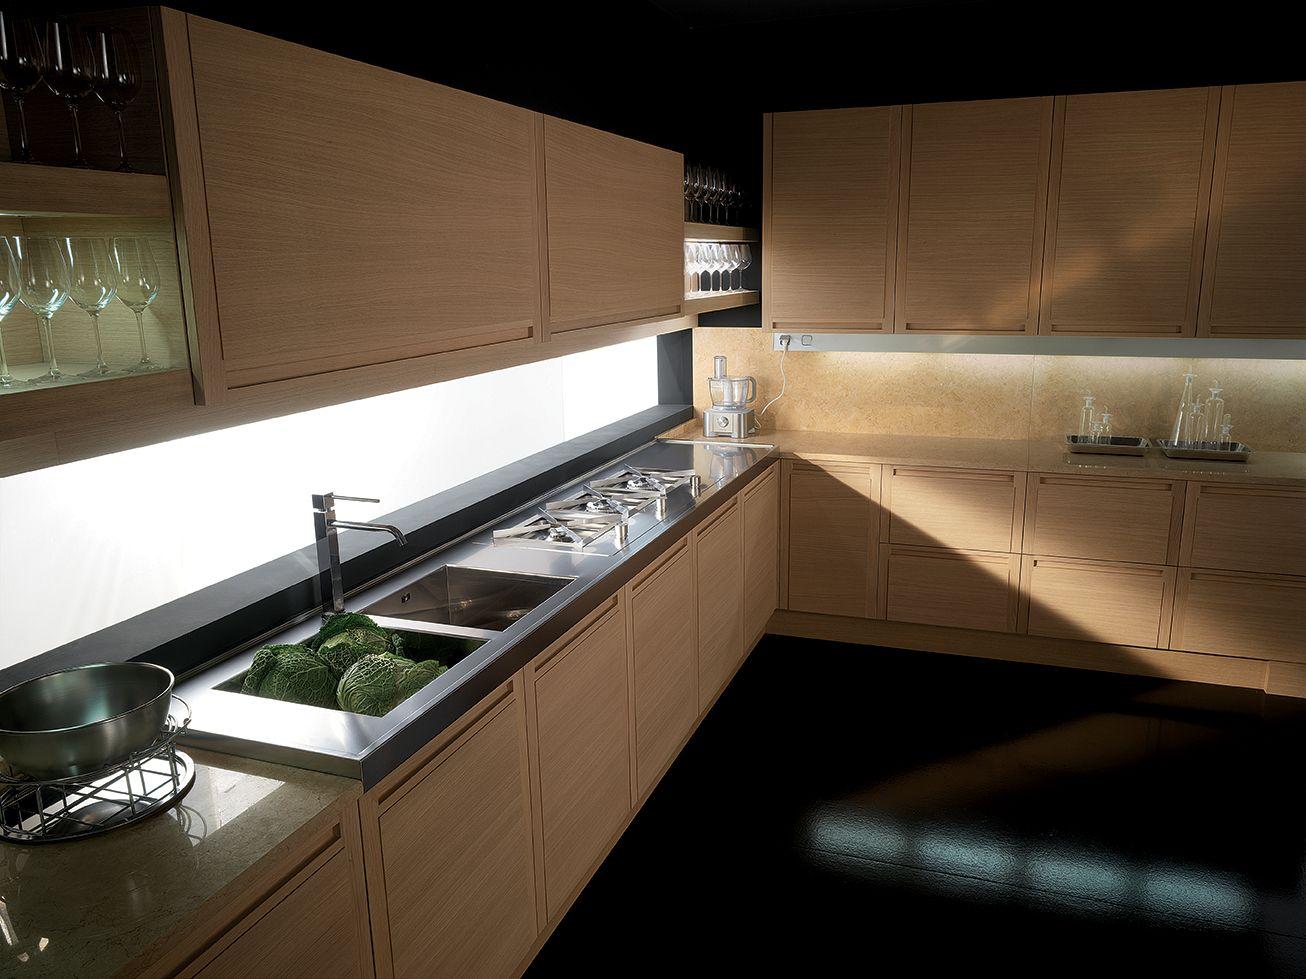 Milano cuisine lin aire by biefbi design fred allison for Cuisine lineaire design